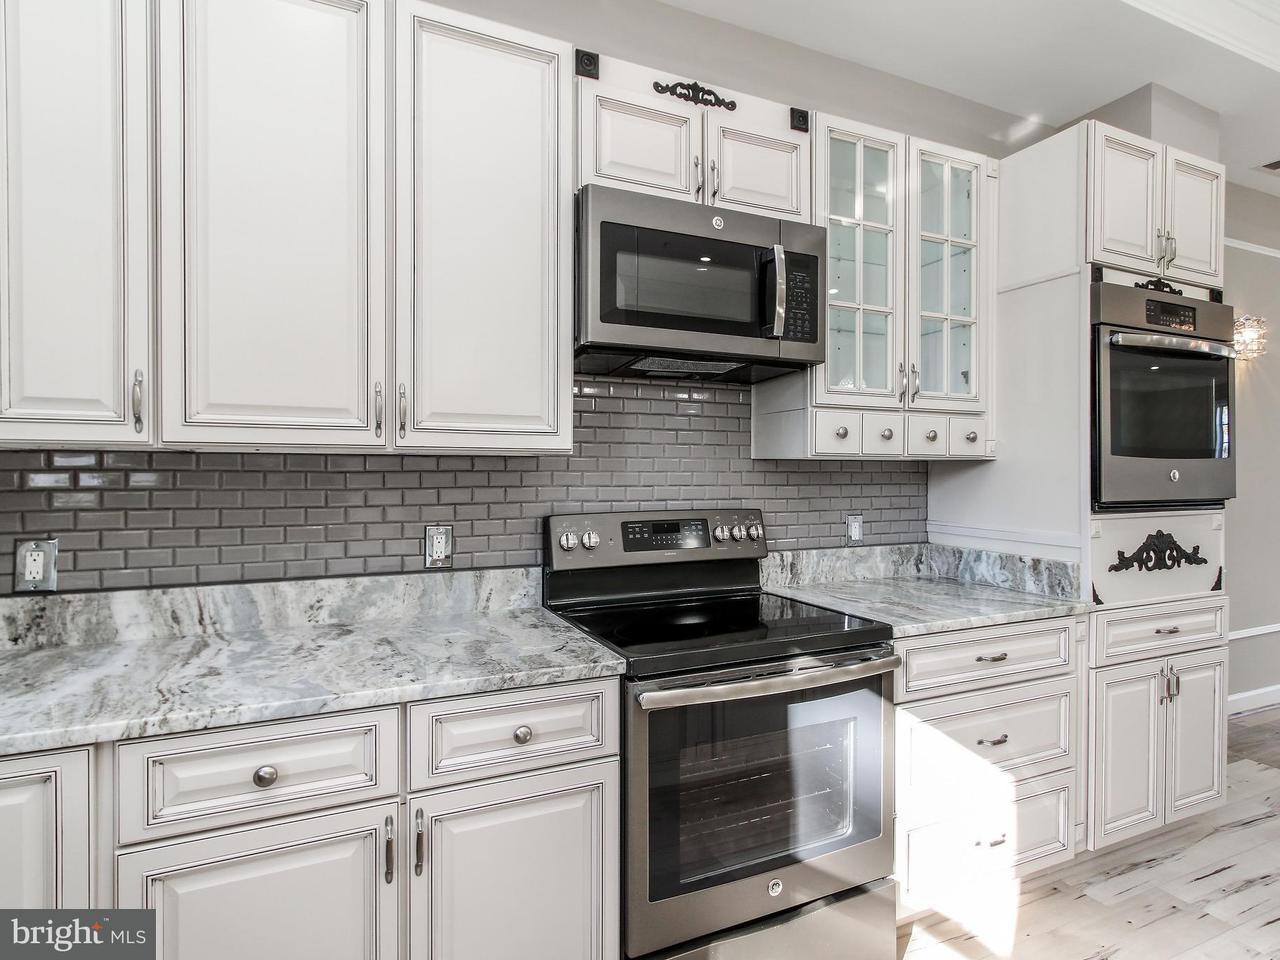 Additional photo for property listing at 5111 Lee St Ne 5111 Lee St Ne 华盛顿市, 哥伦比亚特区 20019 美国